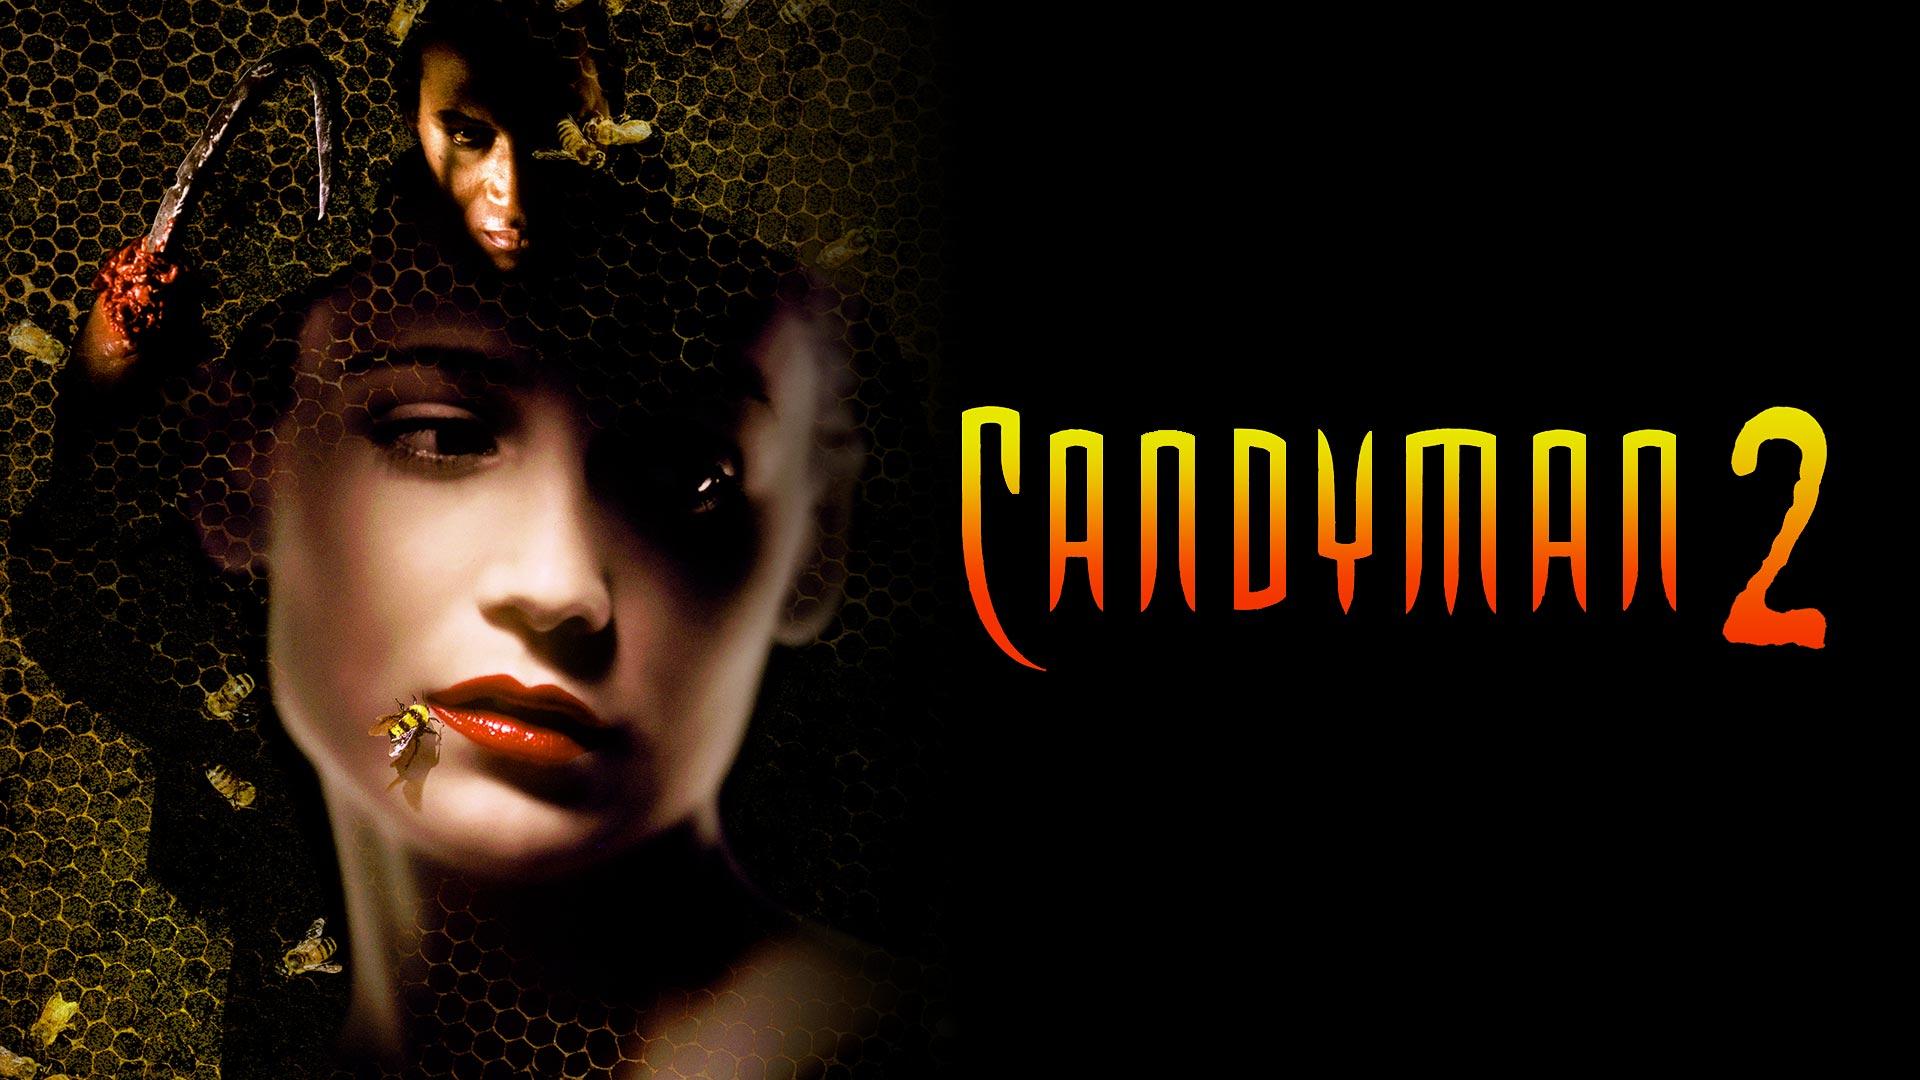 Candyman 2: Farewell To The Flesh